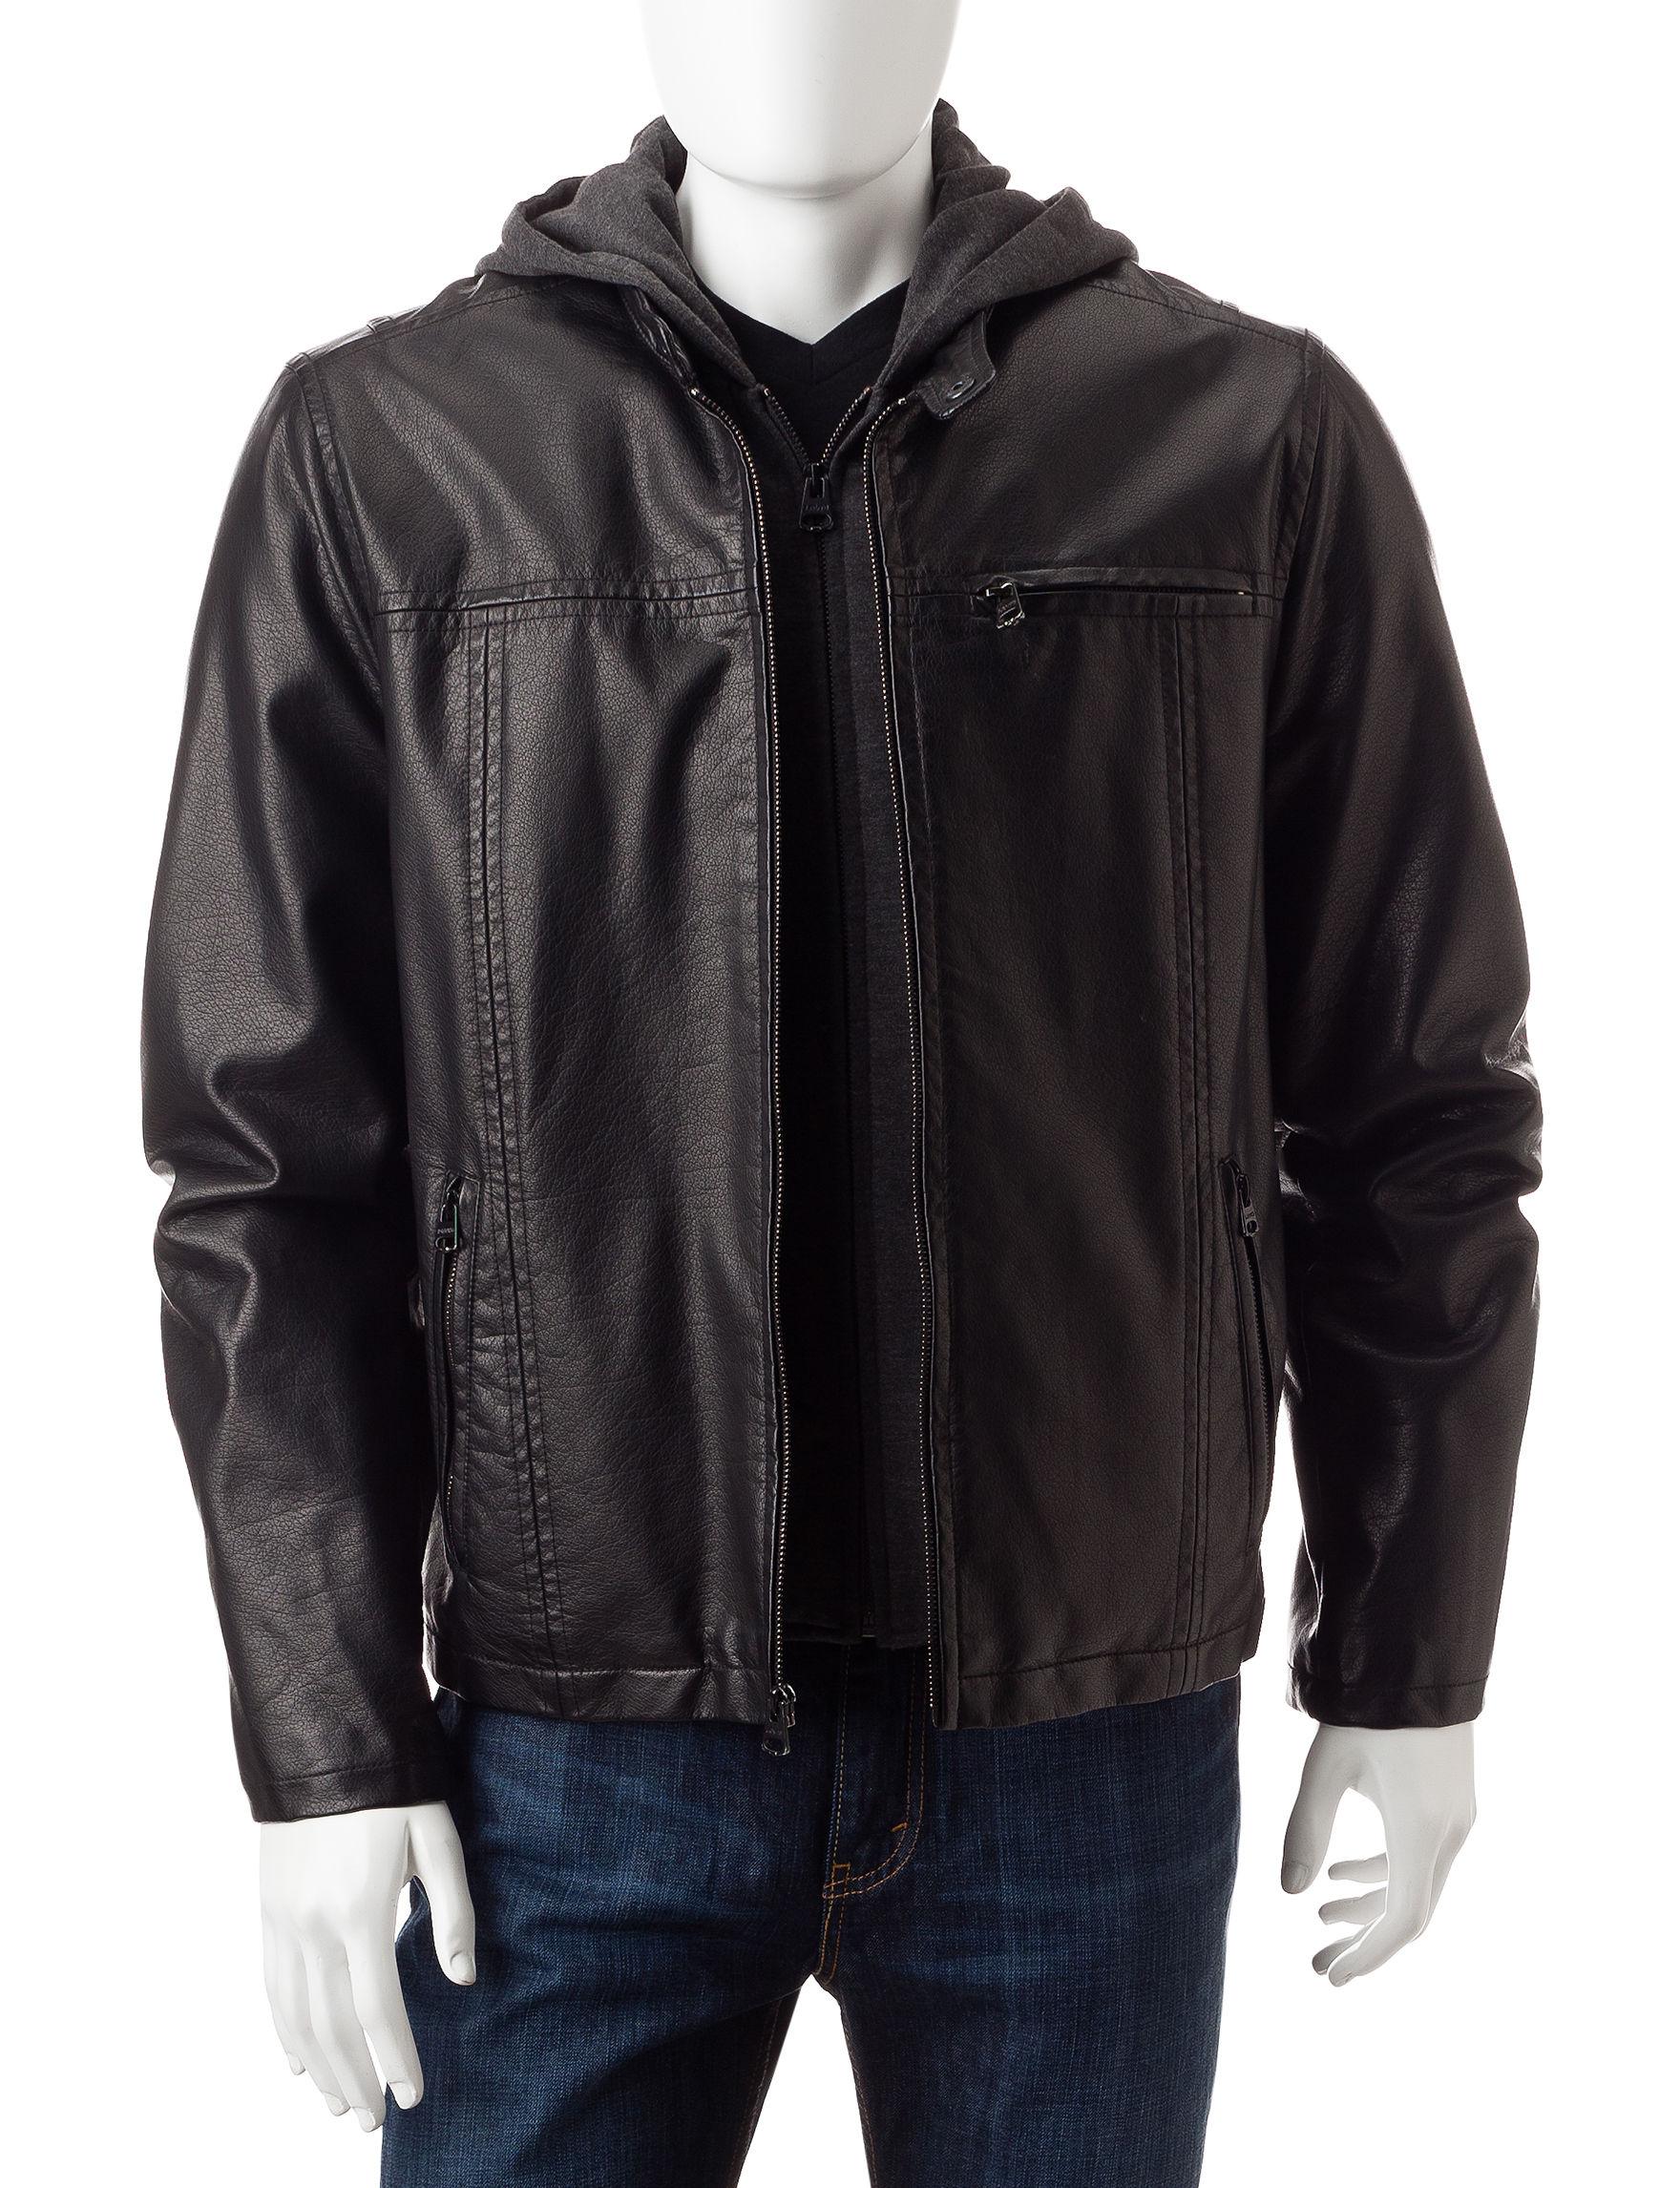 Levi's Black Lightweight Jackets & Blazers